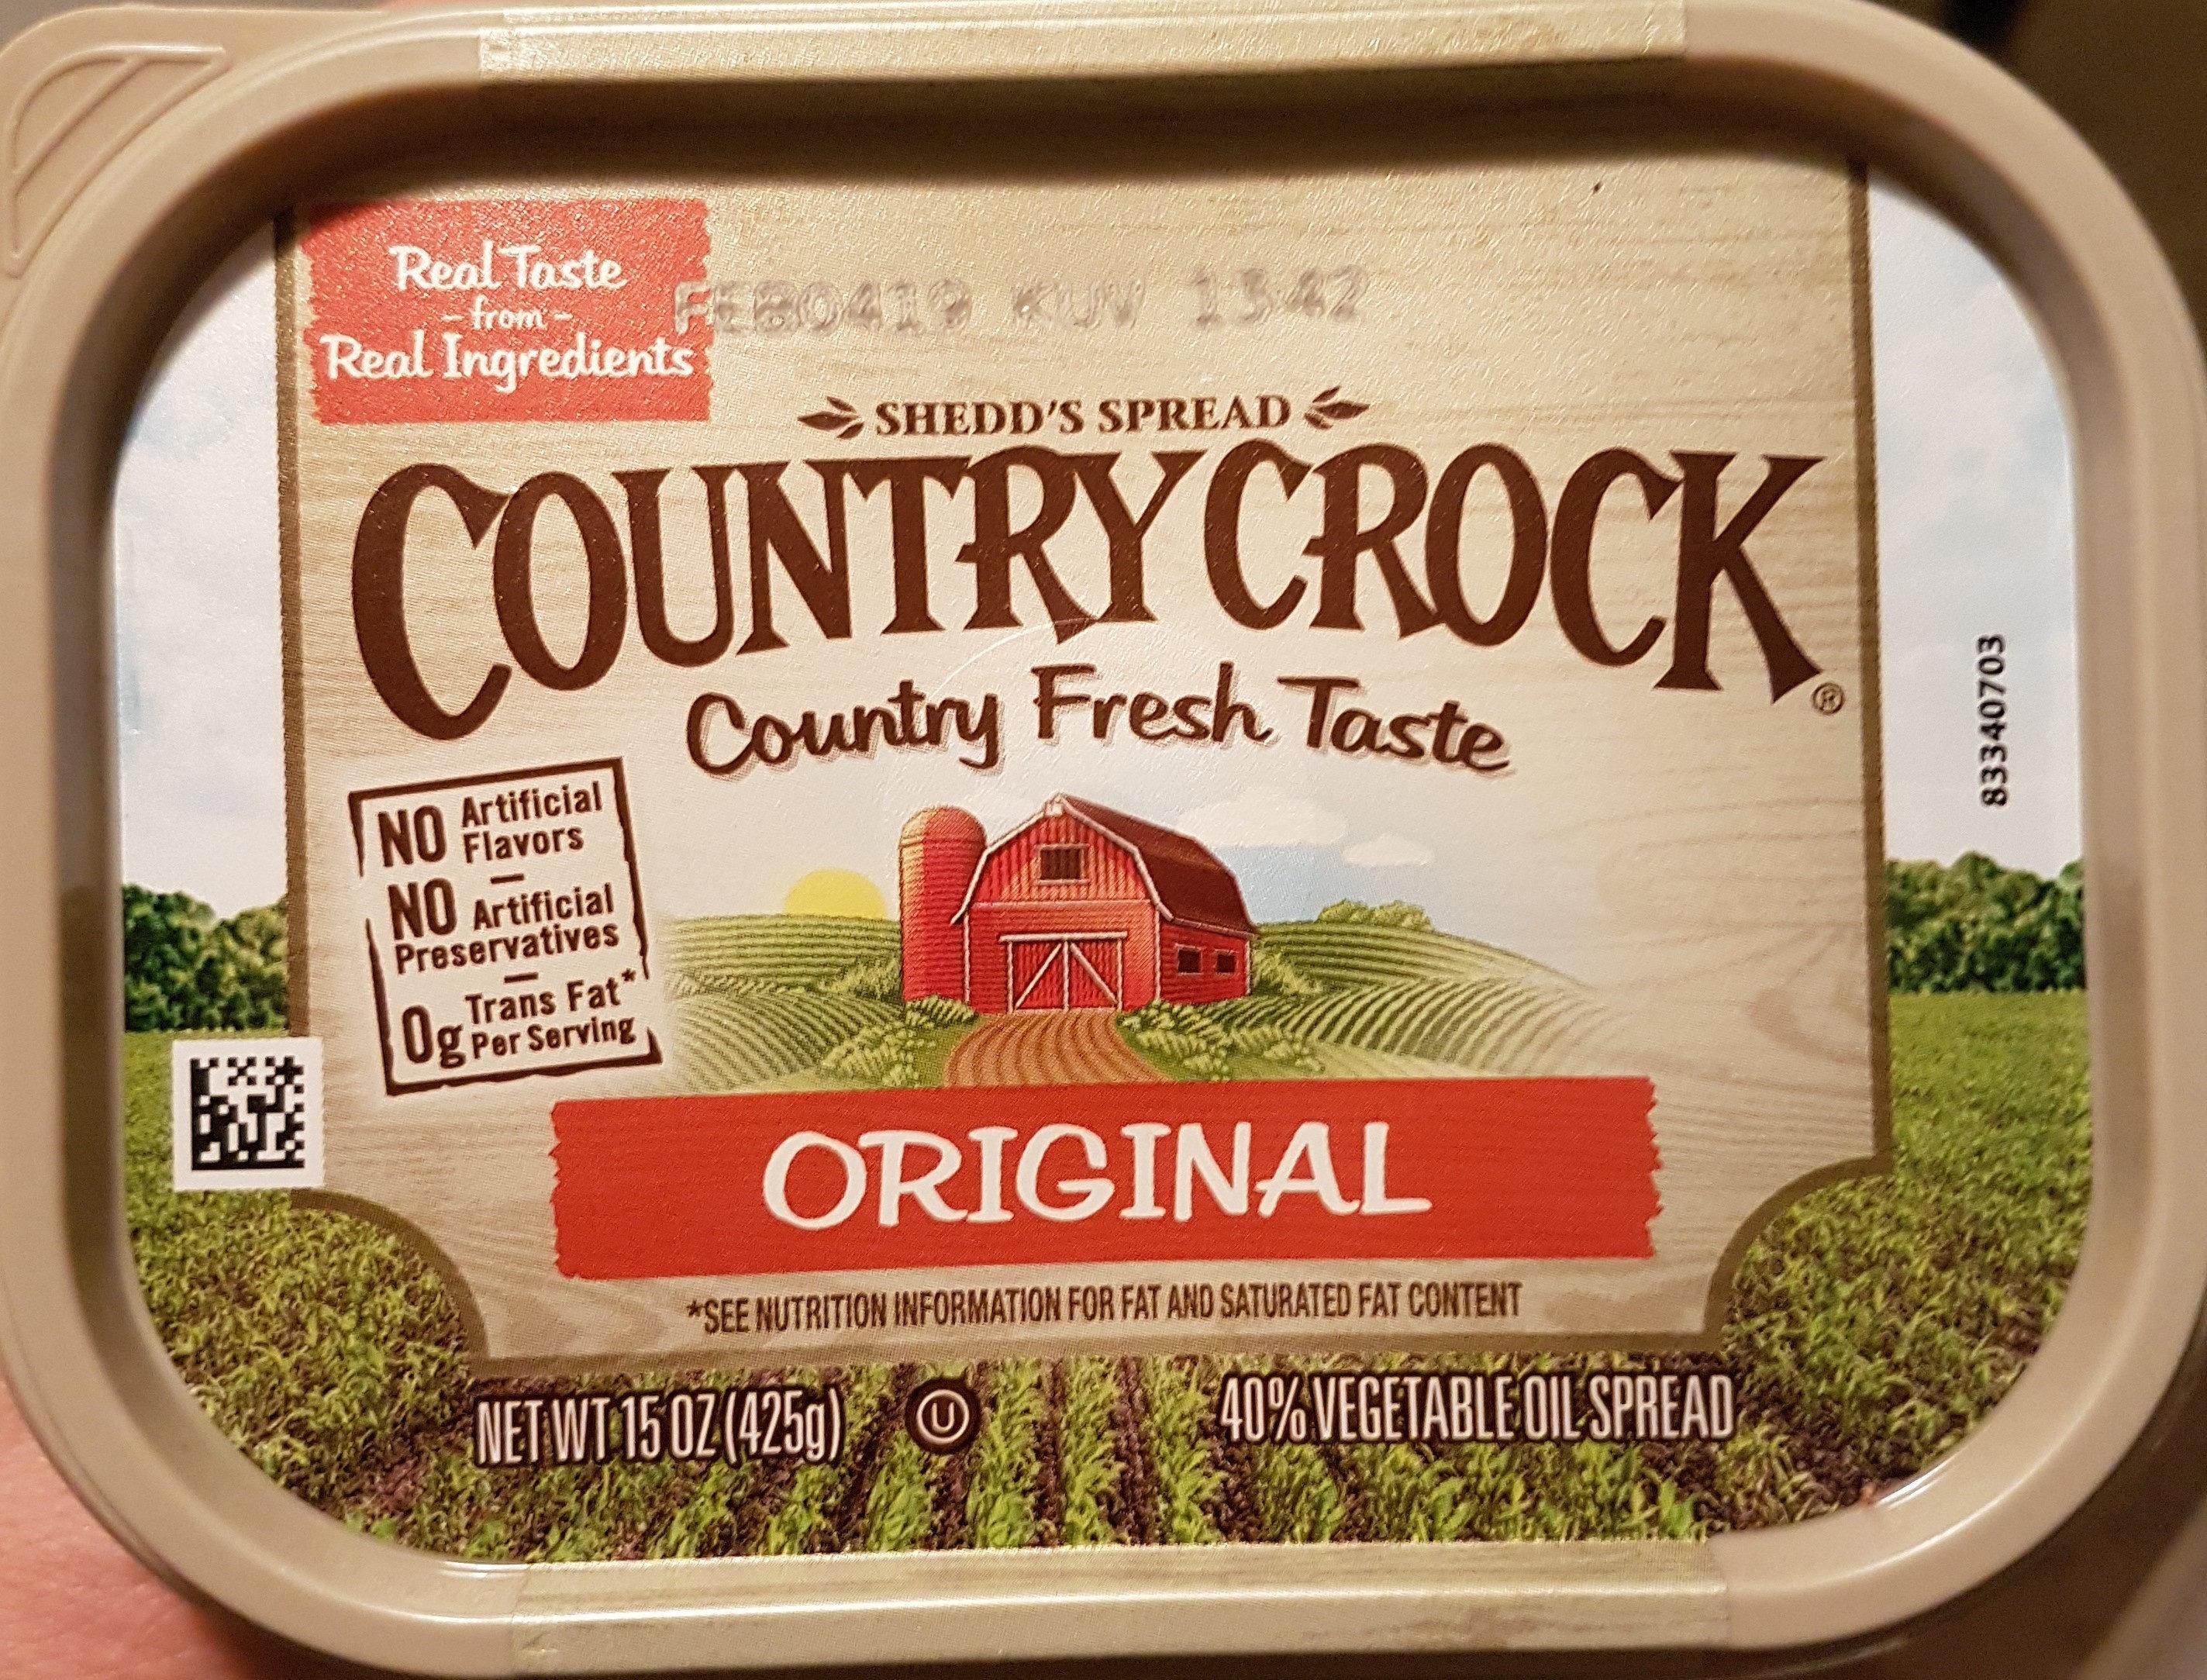 Country crock, original, 40% vegetable oil spread - Product - en